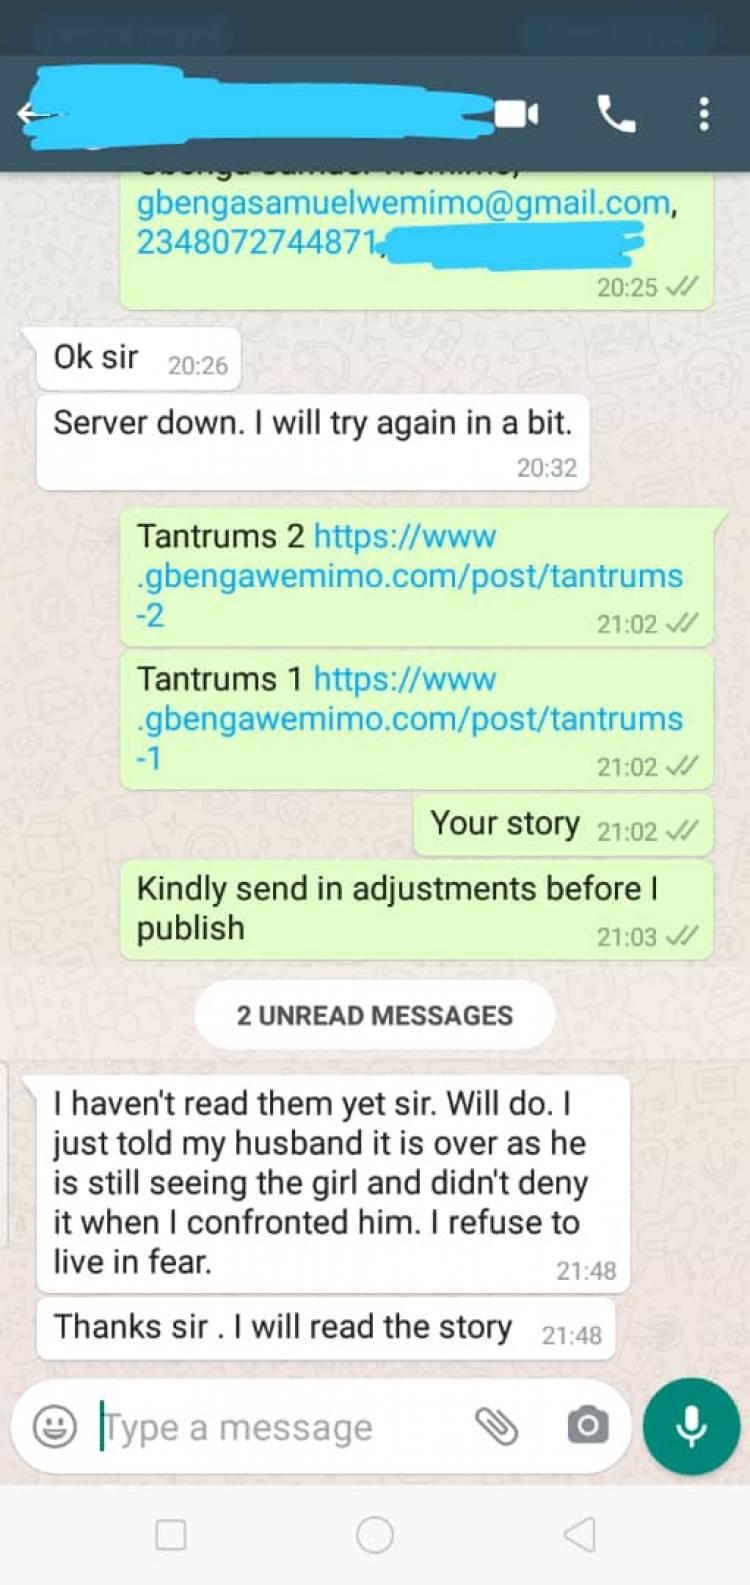 Tantrums 1